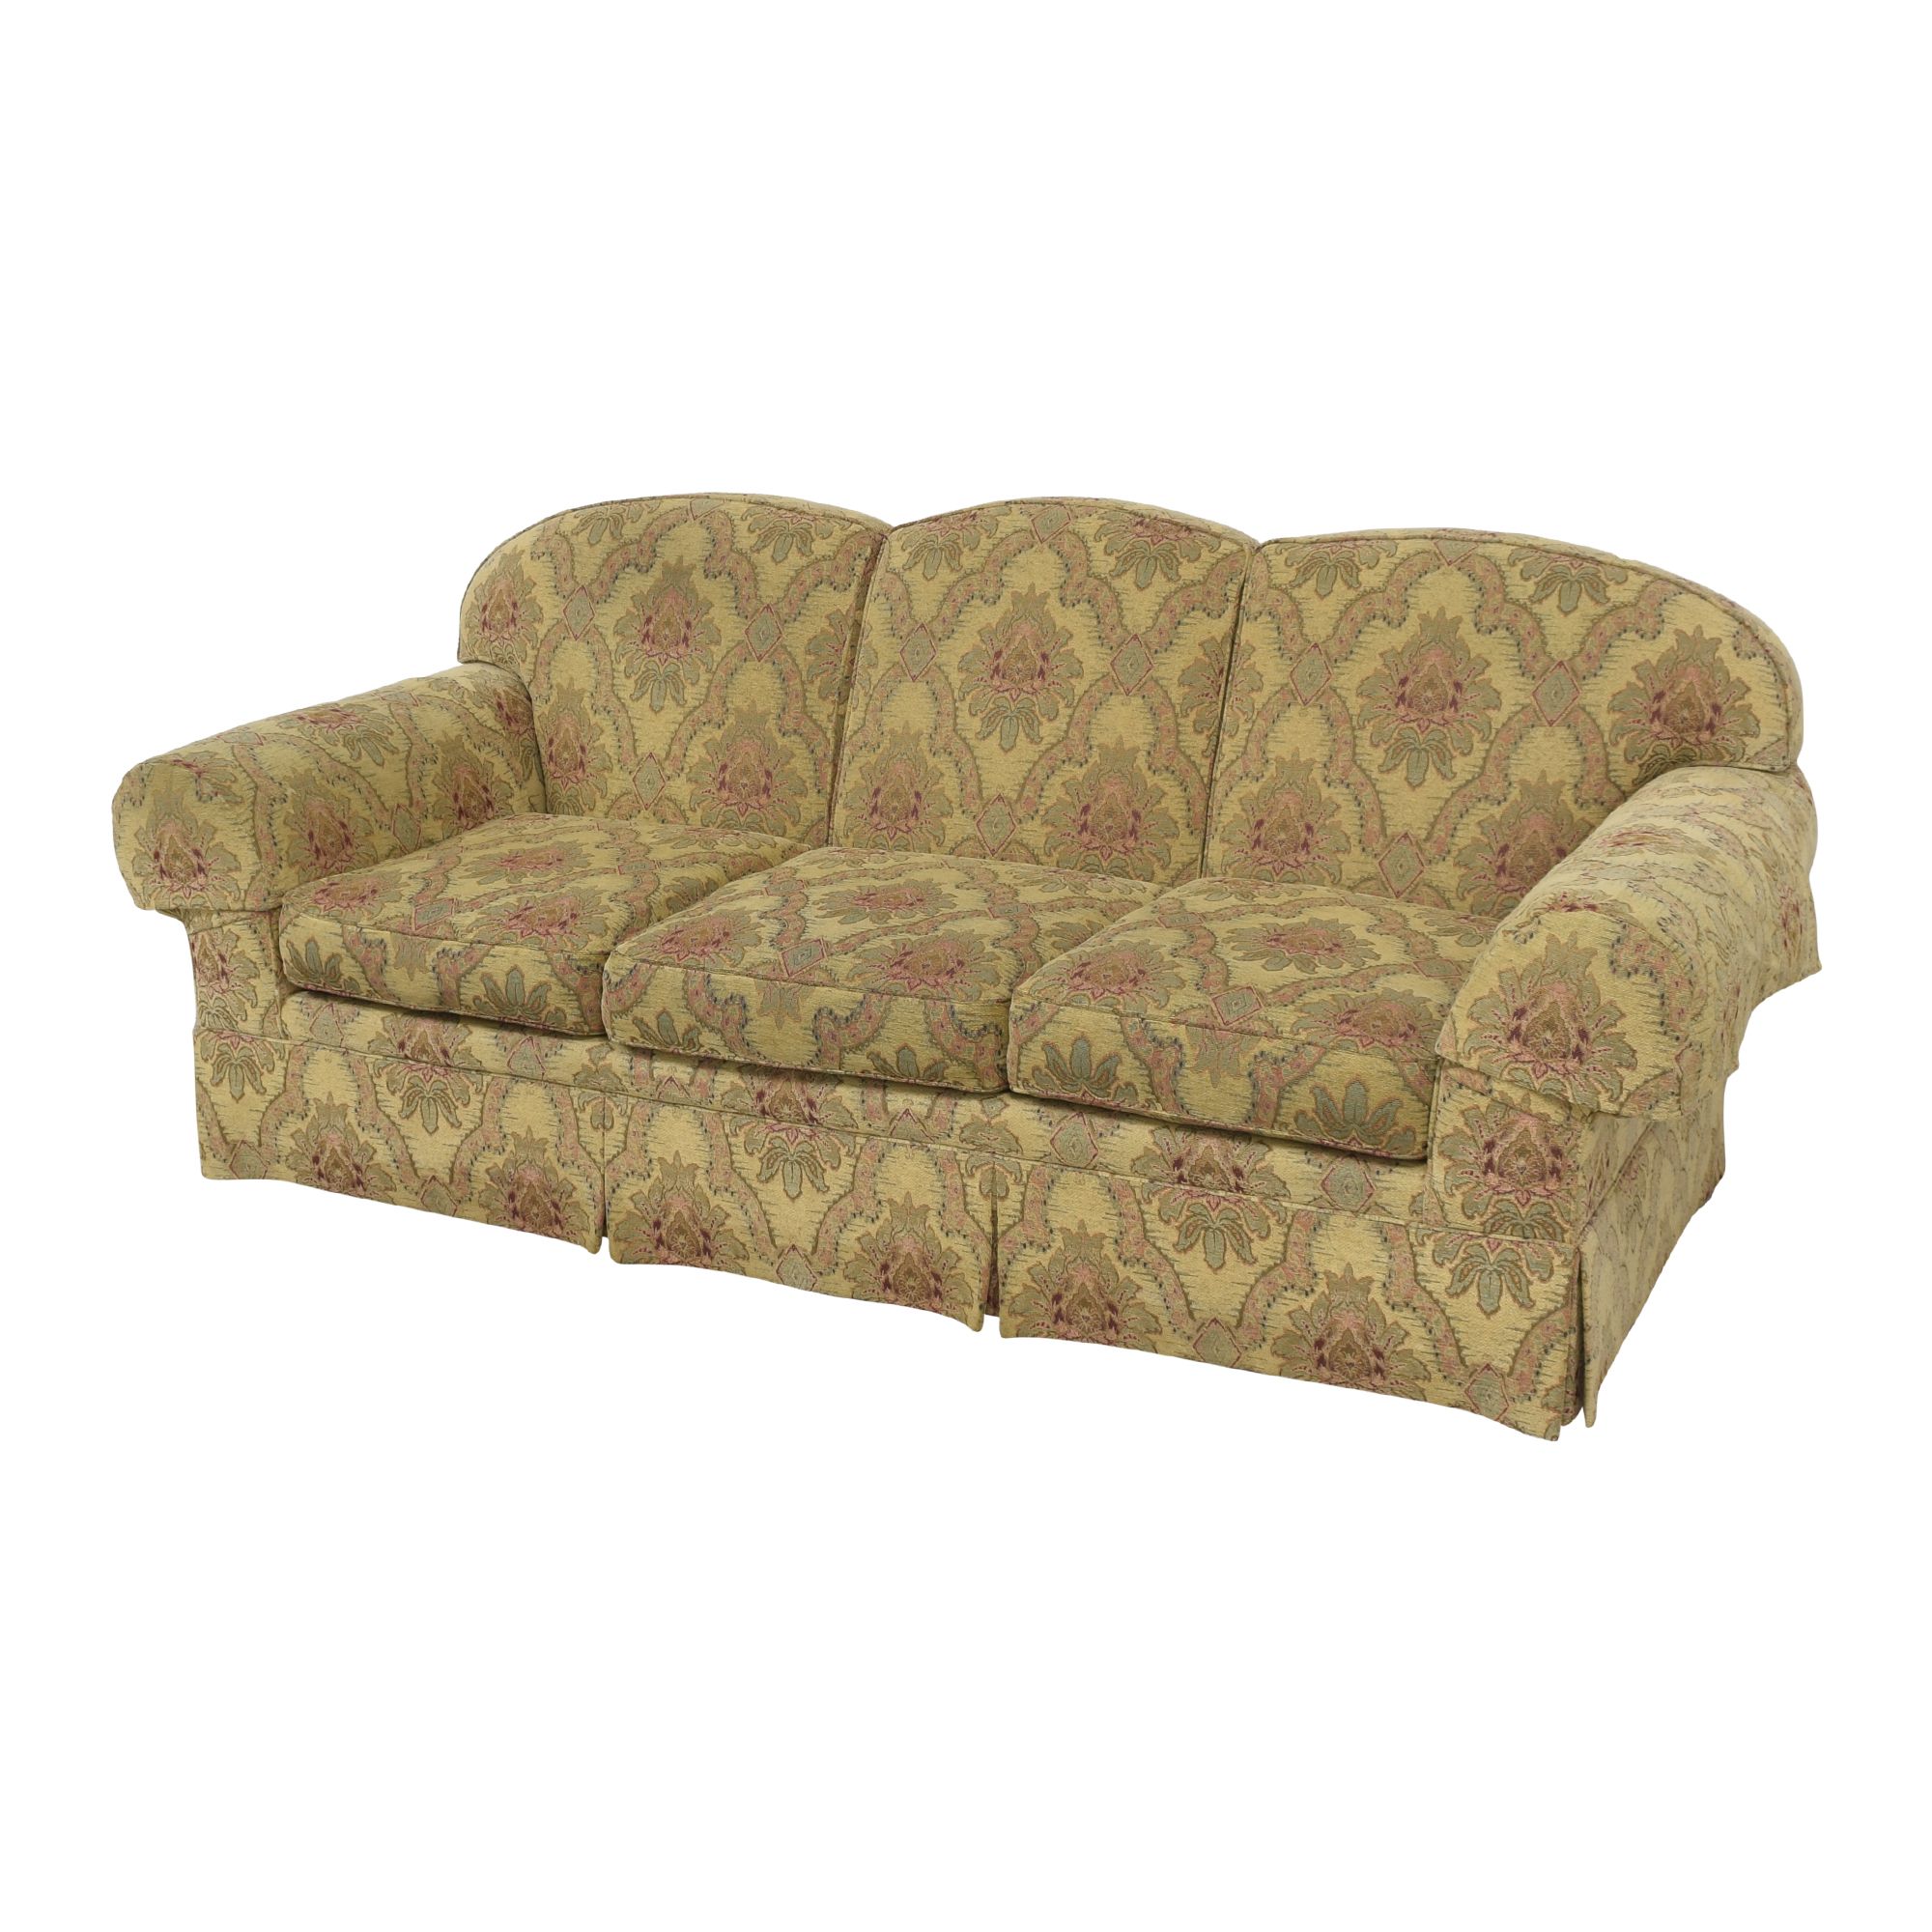 Sherrill Furniture Sherrill Furniture Three Cushion Tapestry Sofa ma